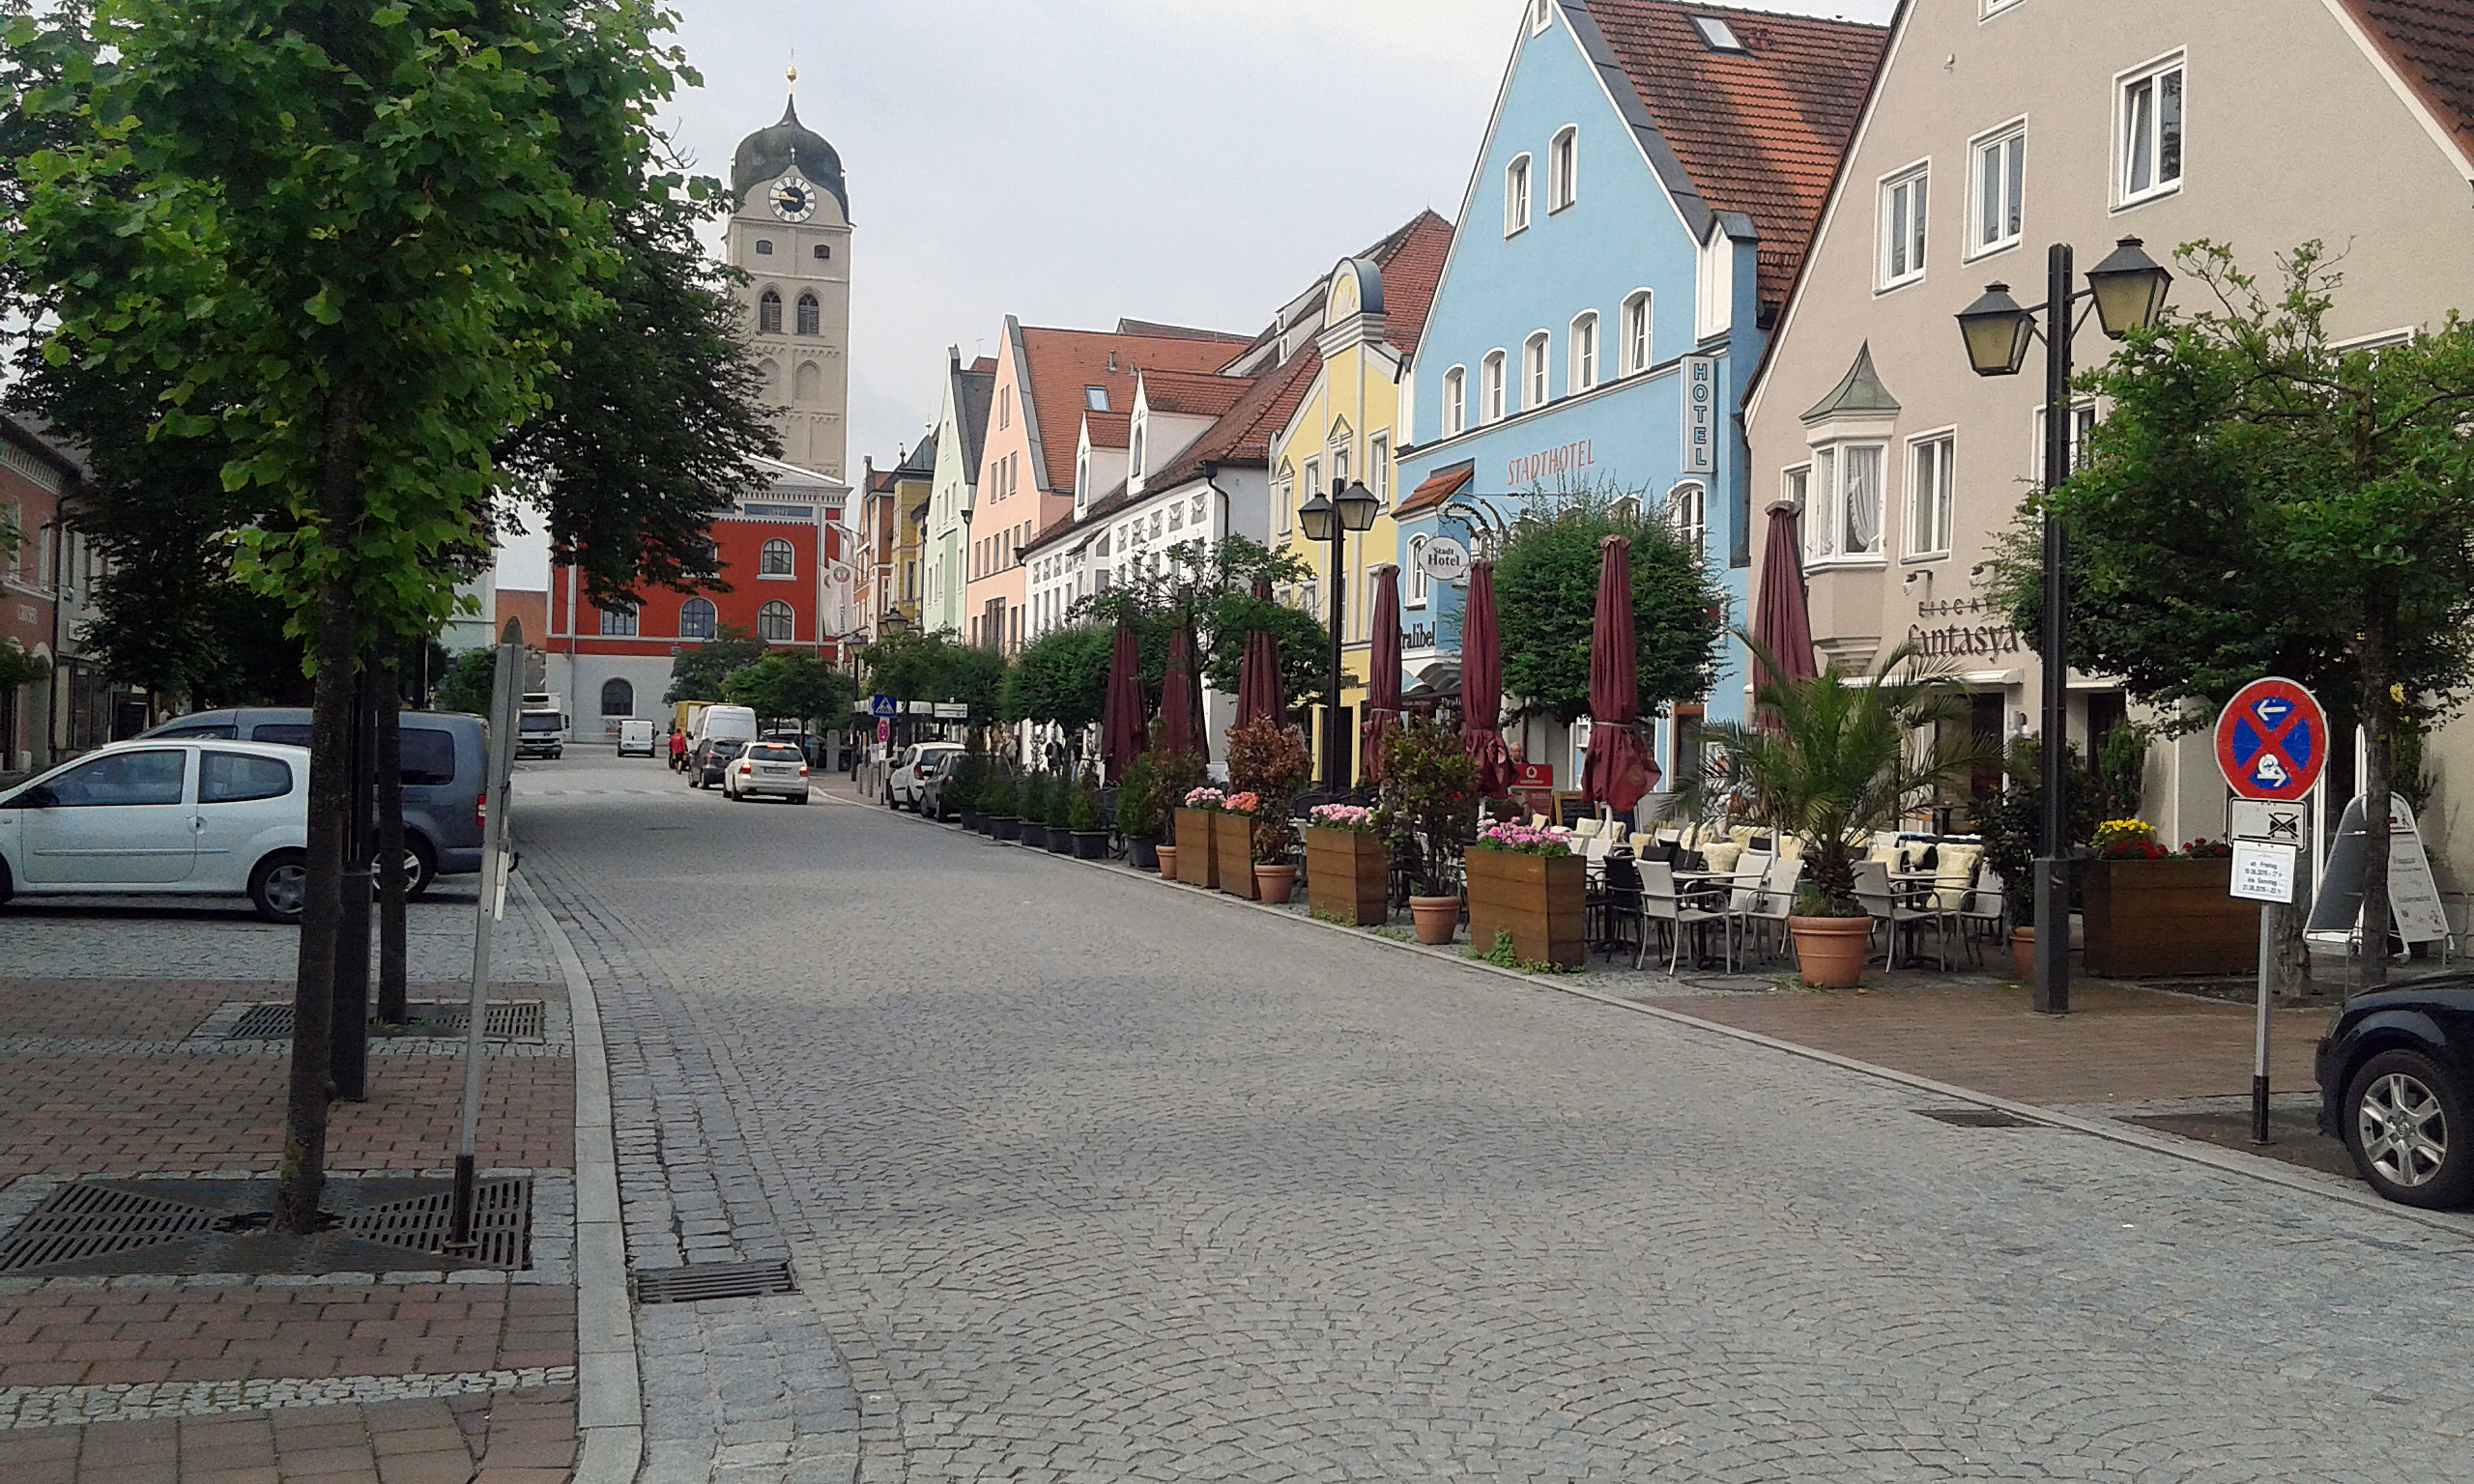 Blogparade 'München': Dahoam is do, wo ma Autofahrn ko...